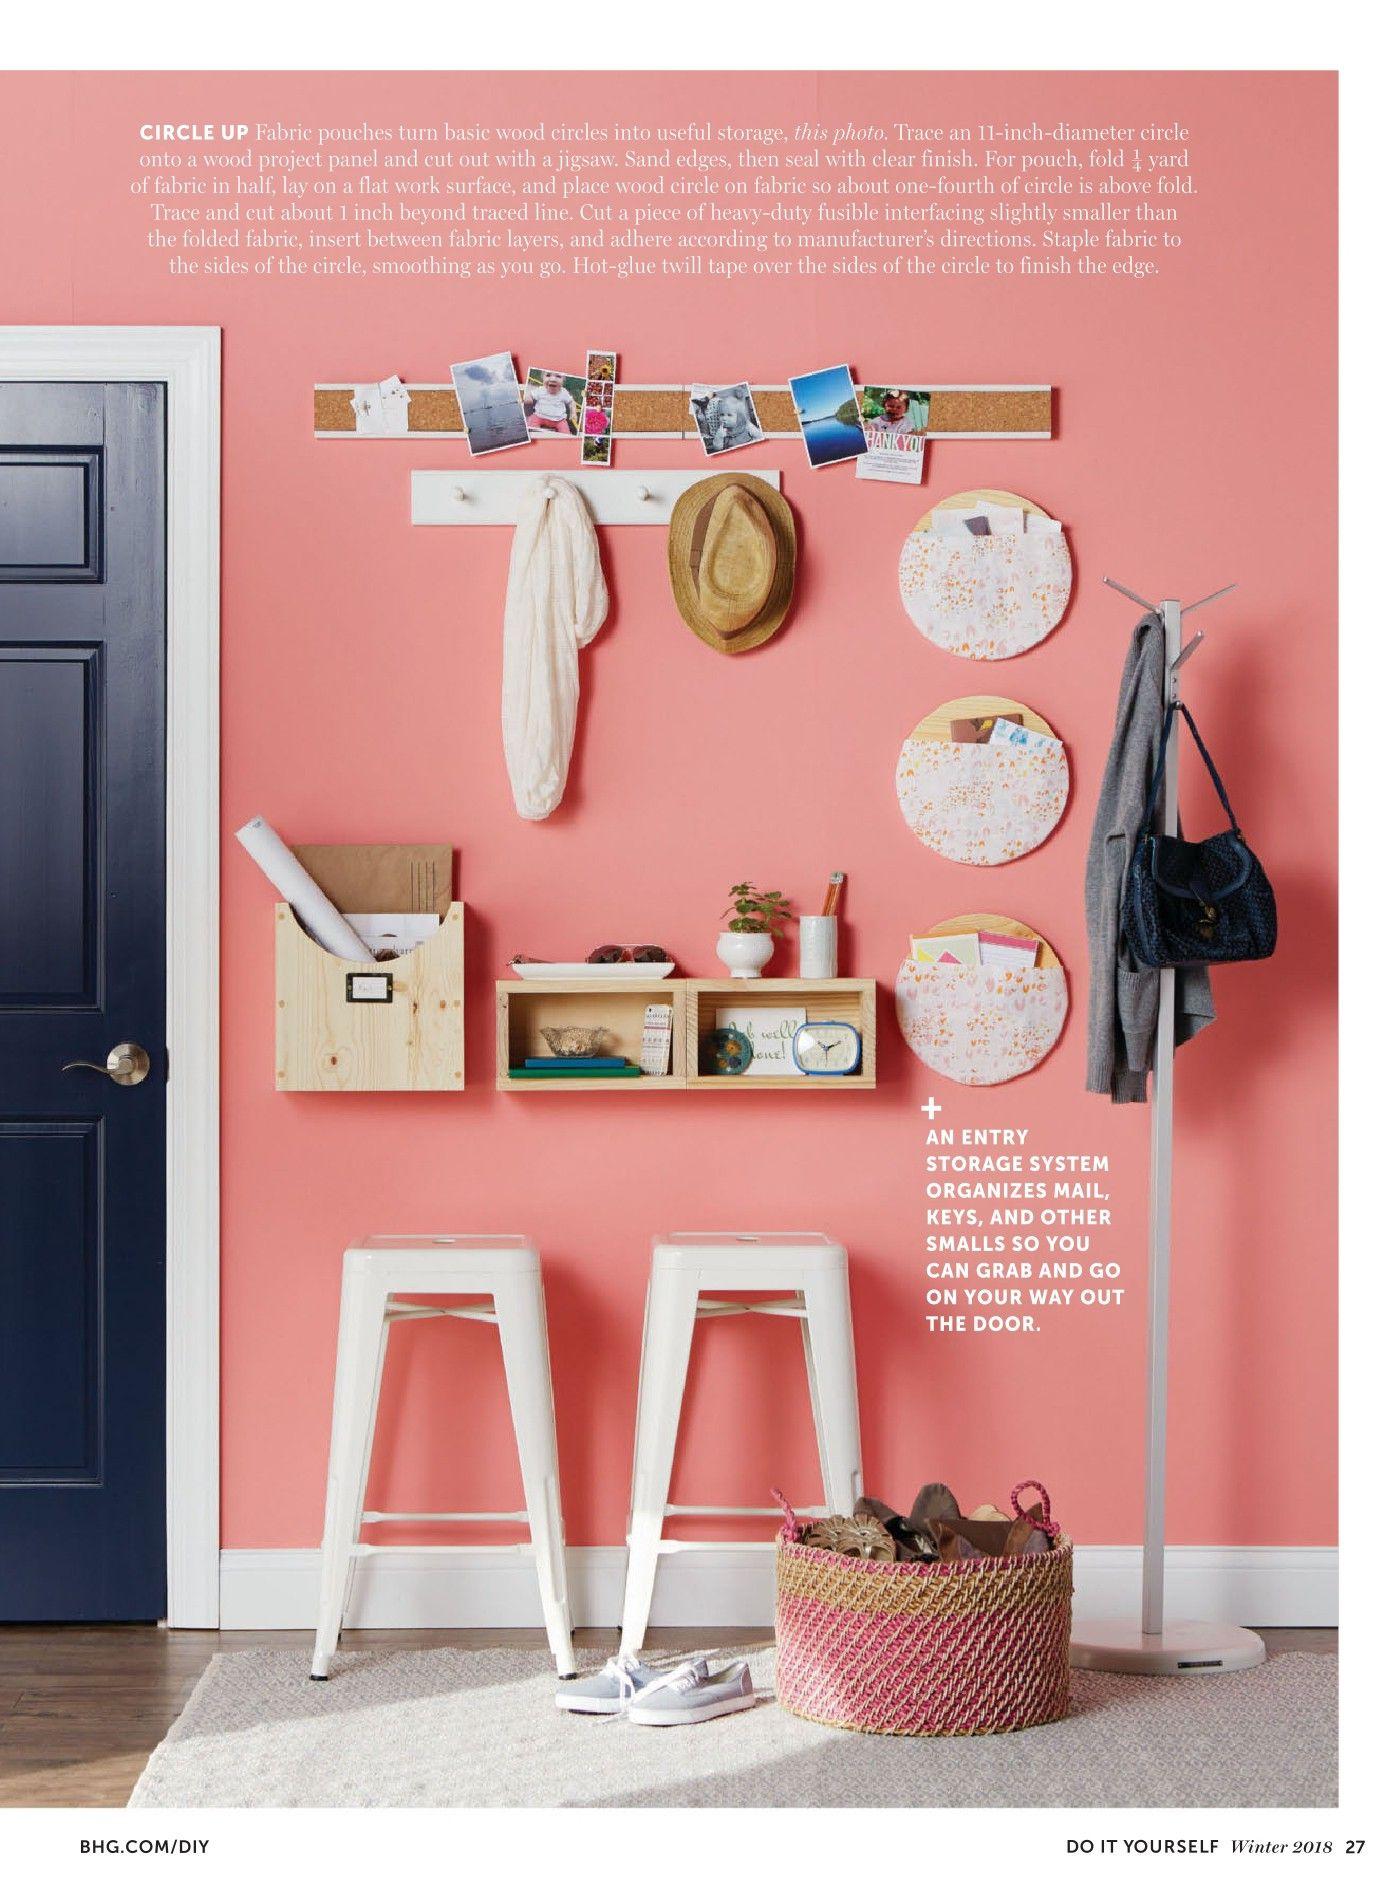 bhg.com | Do it yourself magazine, Home decor, Projects